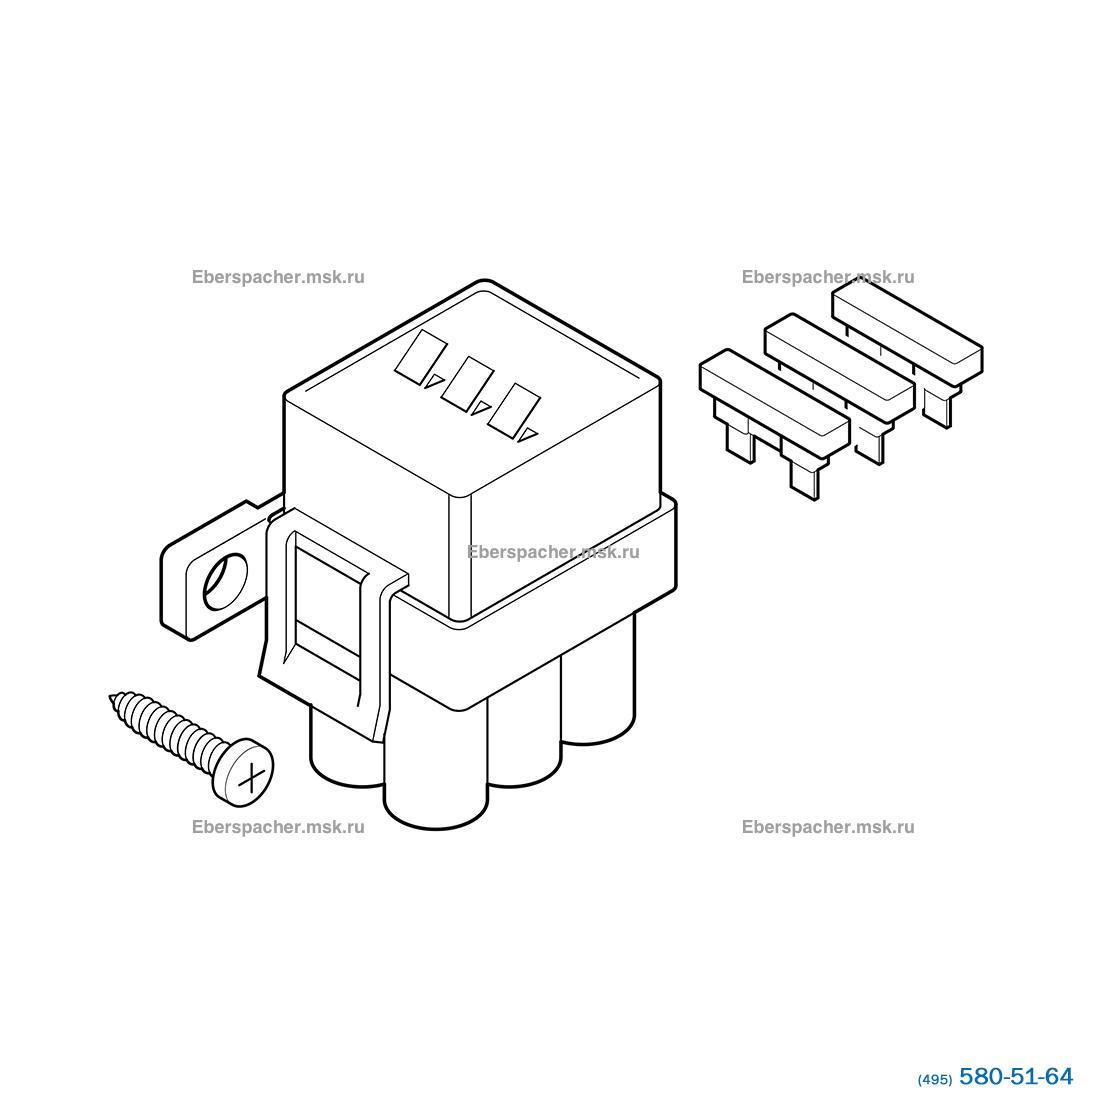 Блок из трех плавких предохарнителей 5А, 15А, 25А, комплект | Артикул: 221000310600